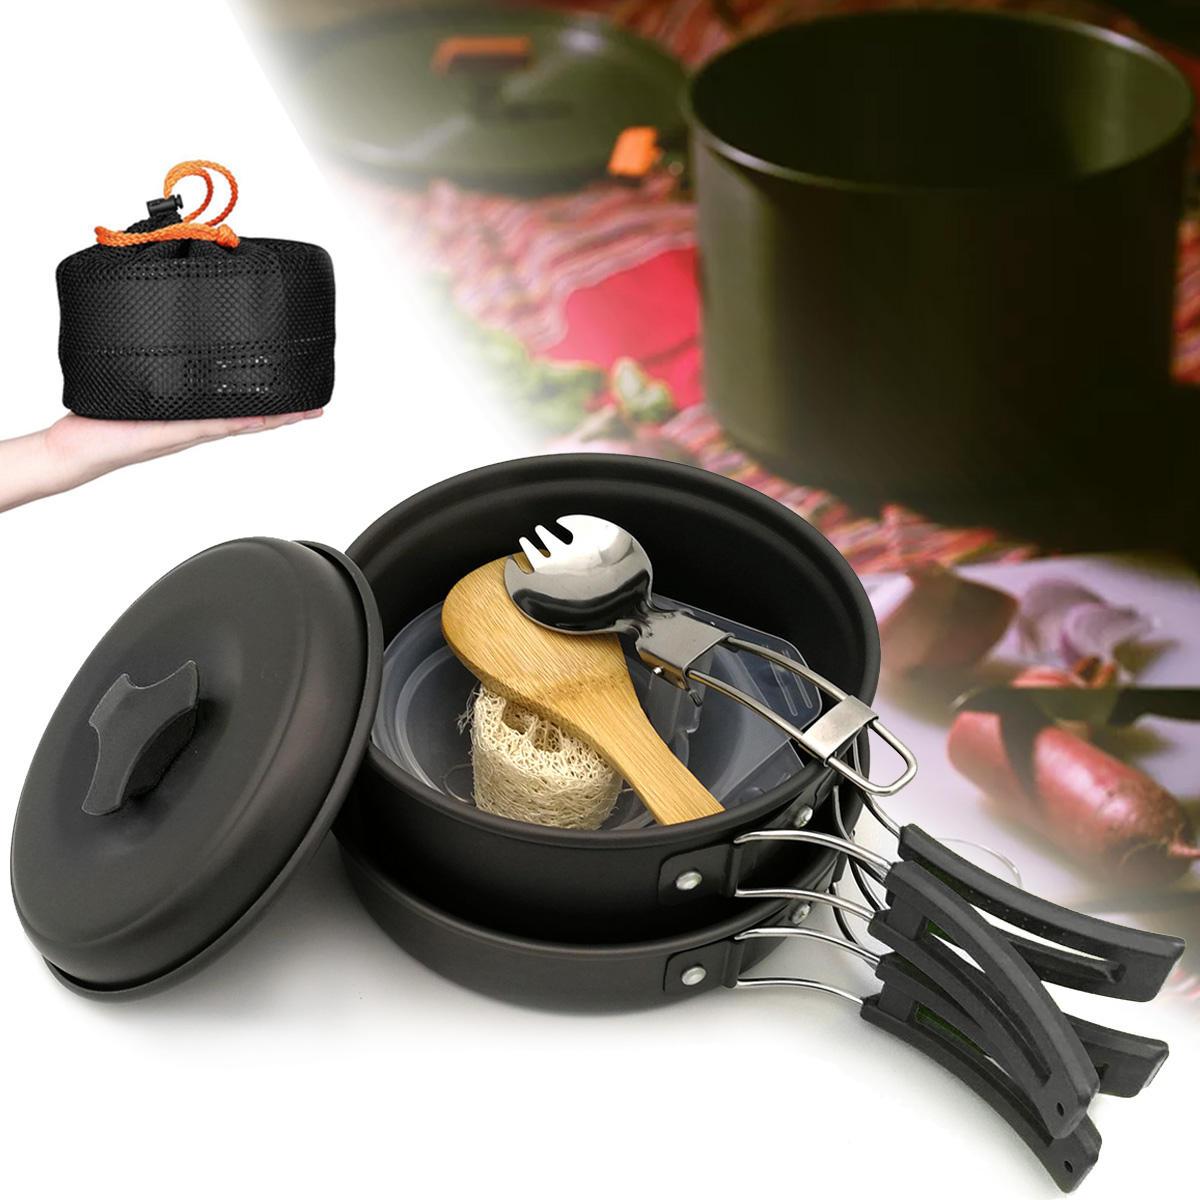 1-2 People Portable Cookware Set Backpacking Gas Butane Propane Canister Cooking Stove Burner Set Pot Pan Bowl Picnic BBQ Tableware - Black